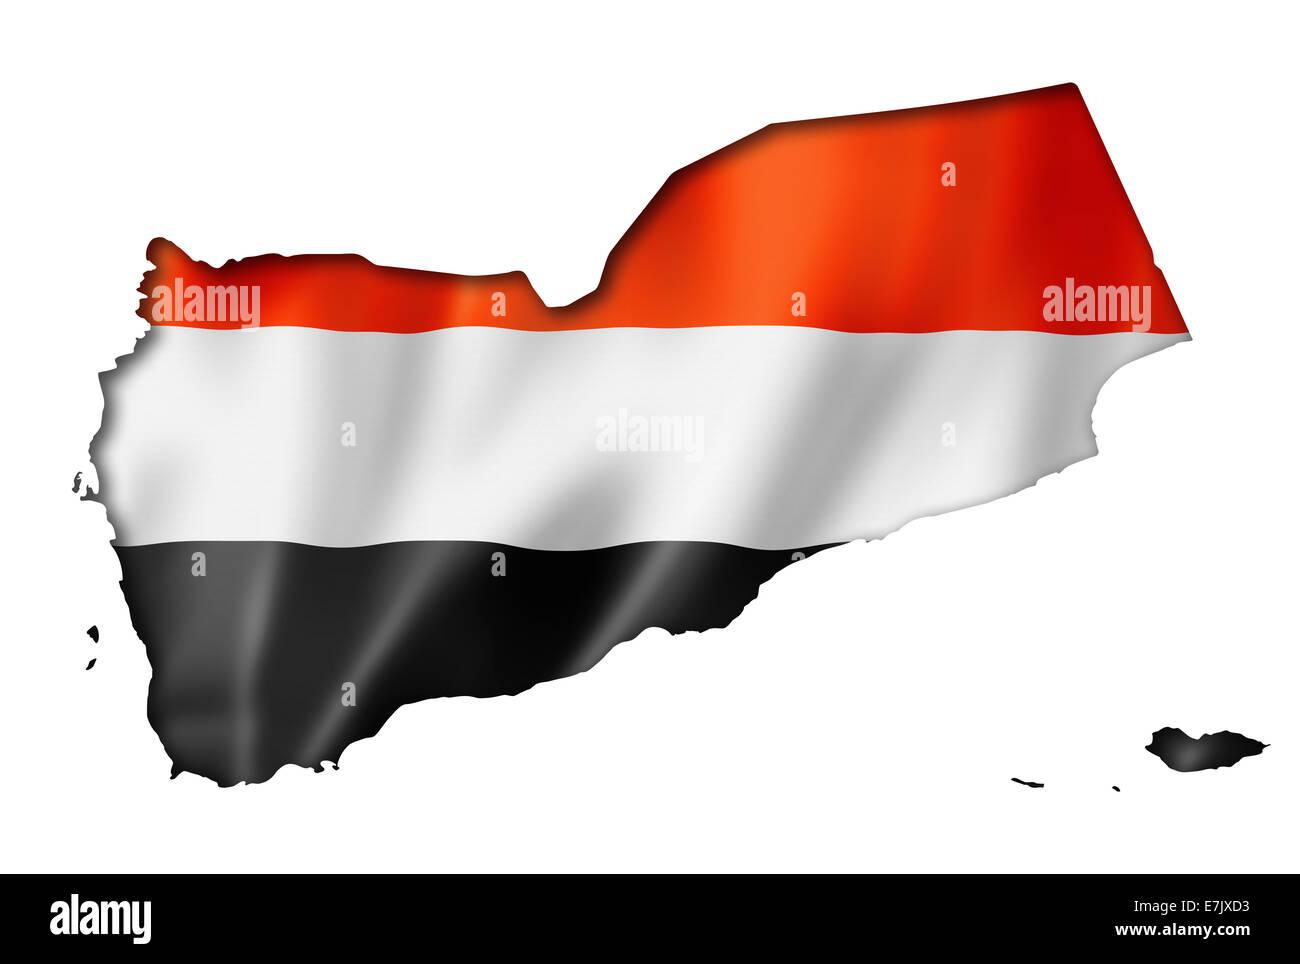 Yemen flag map, three dimensional render, isolated on white - Stock Image